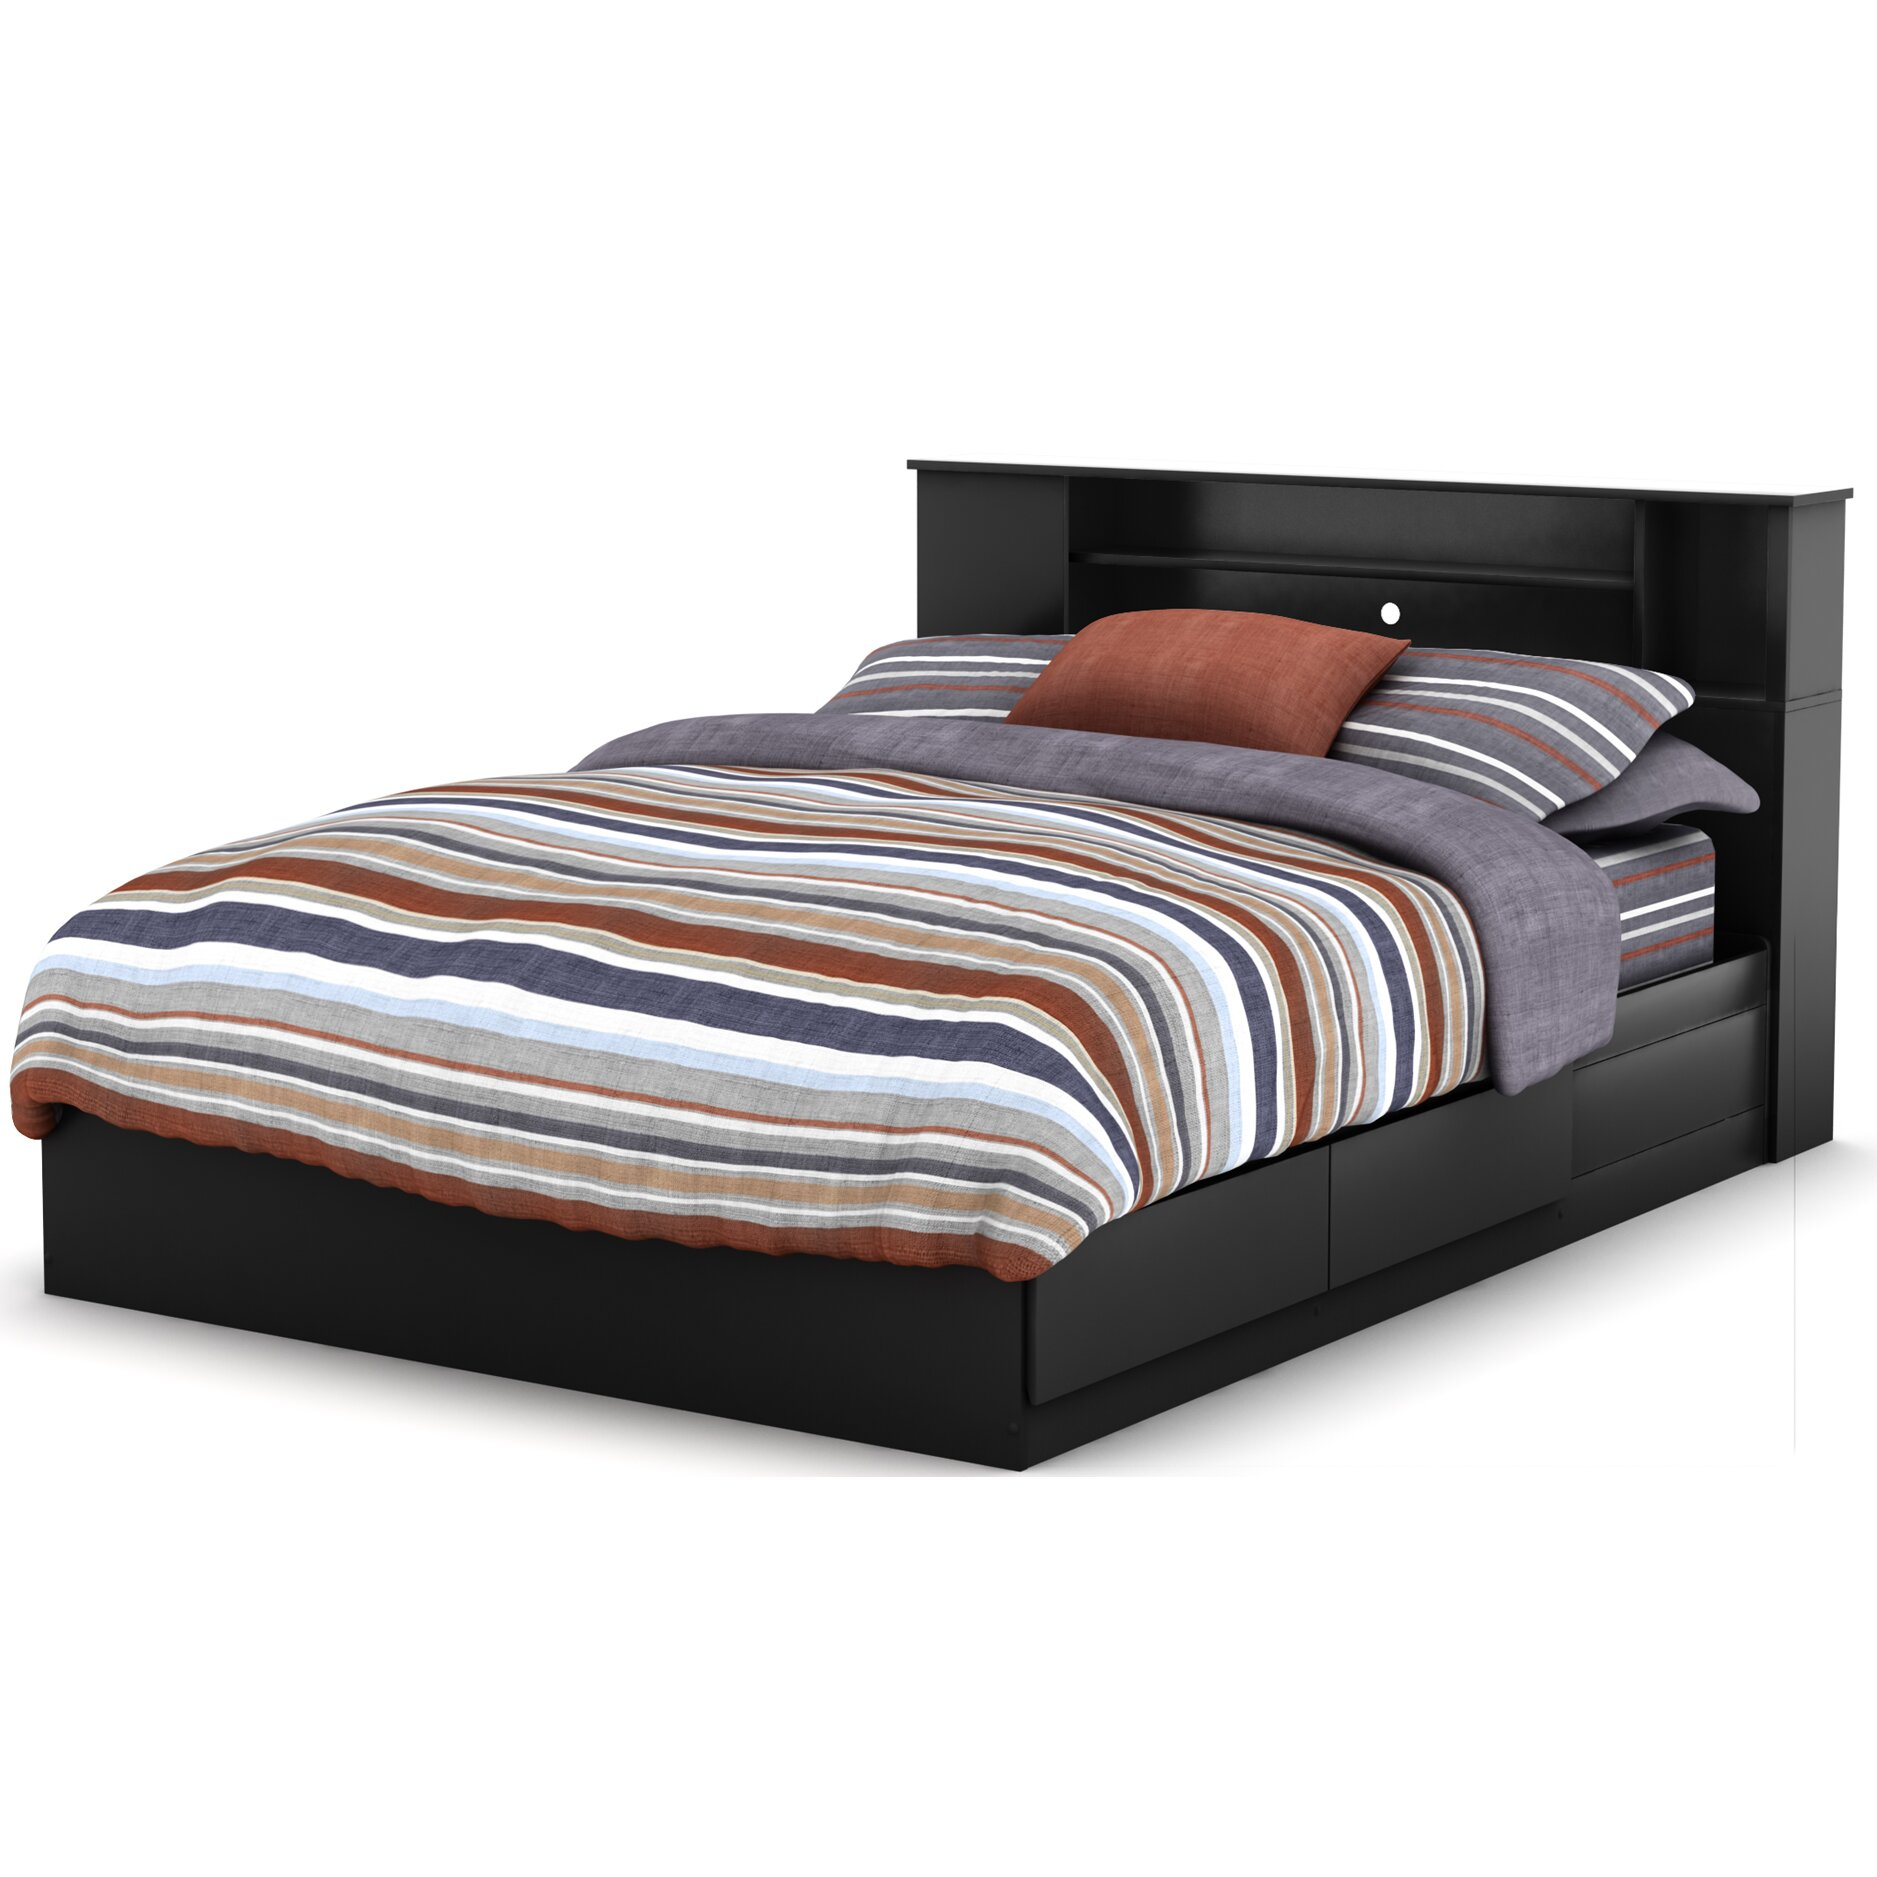 South Shore Vito Queen Storage Bed And Bookcase Headboard